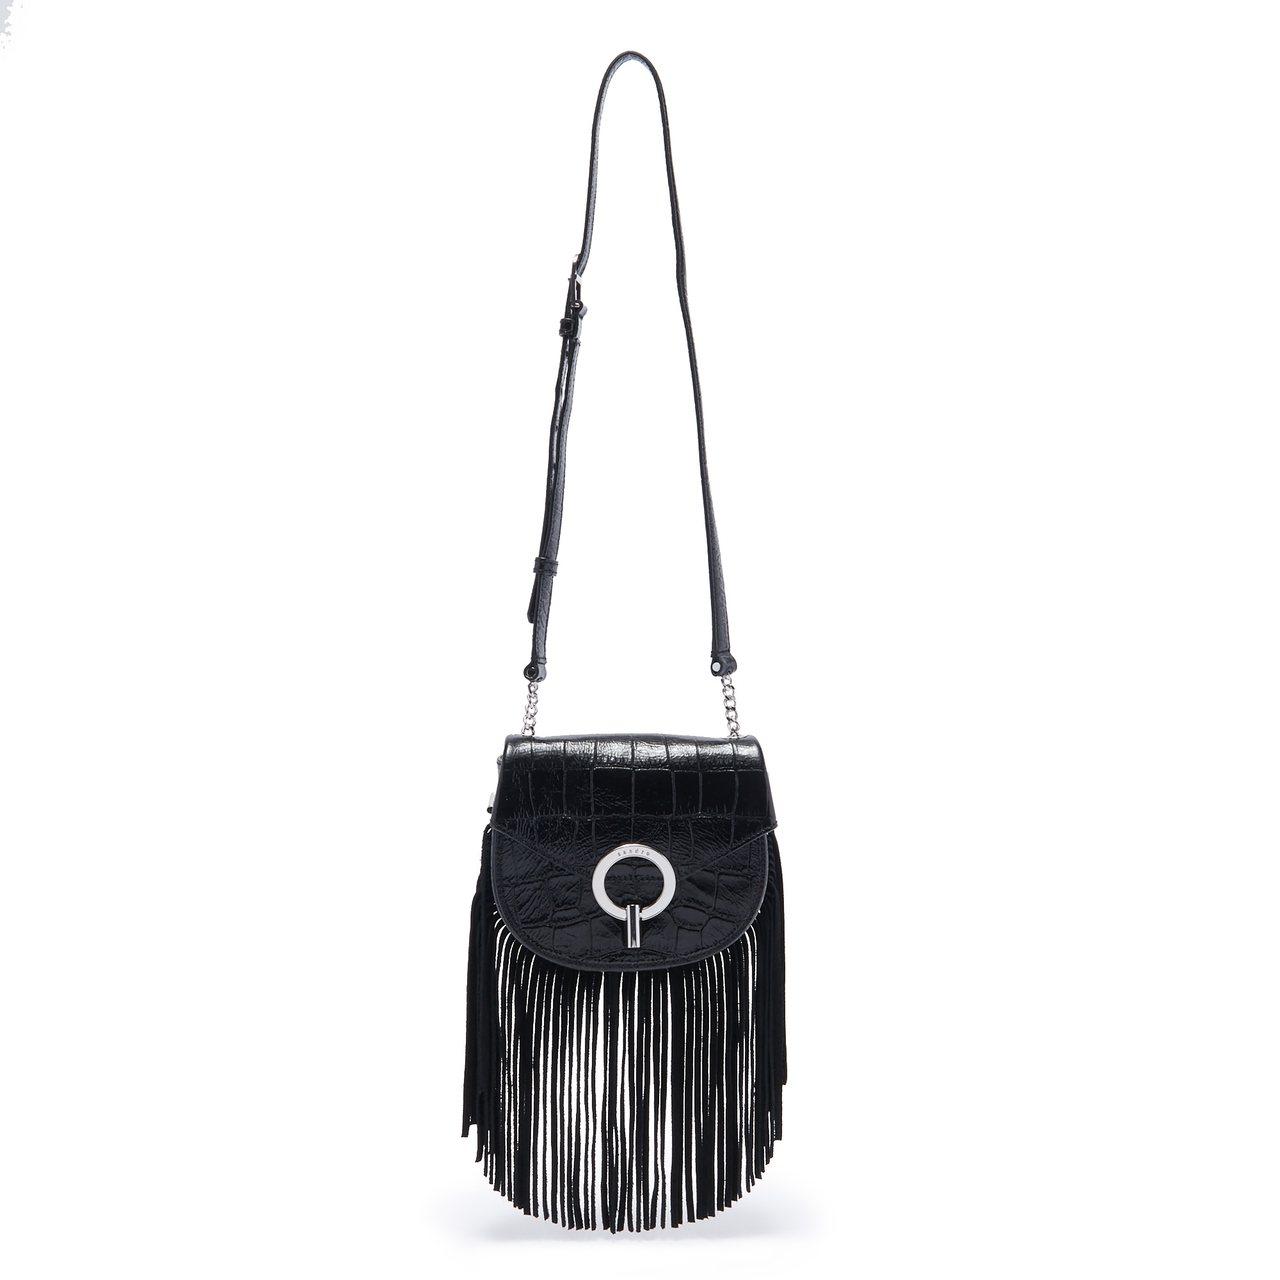 sandro流蘇黑色肩背包,售價12,290元。圖/sandro提供